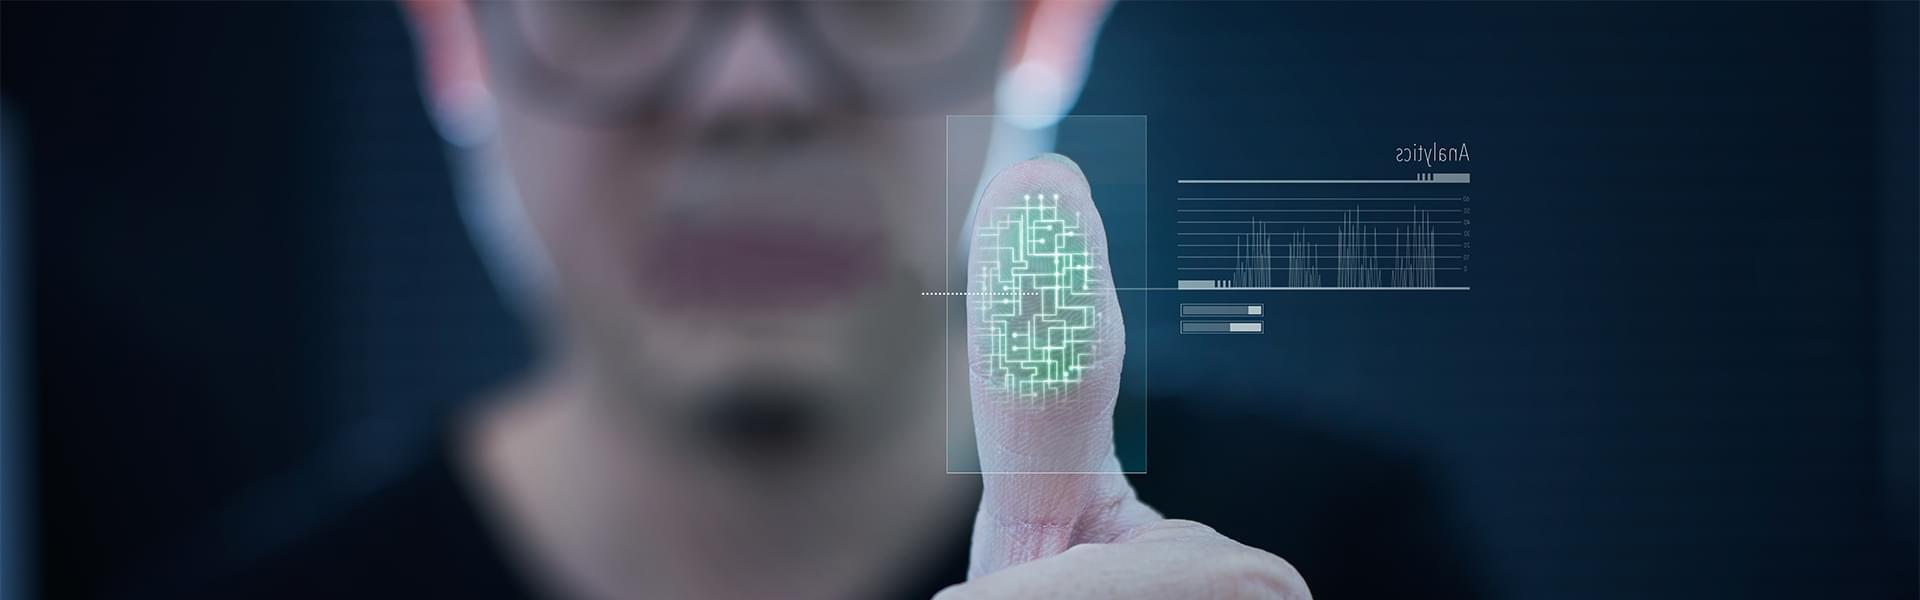 Glowing biometric fingerprint